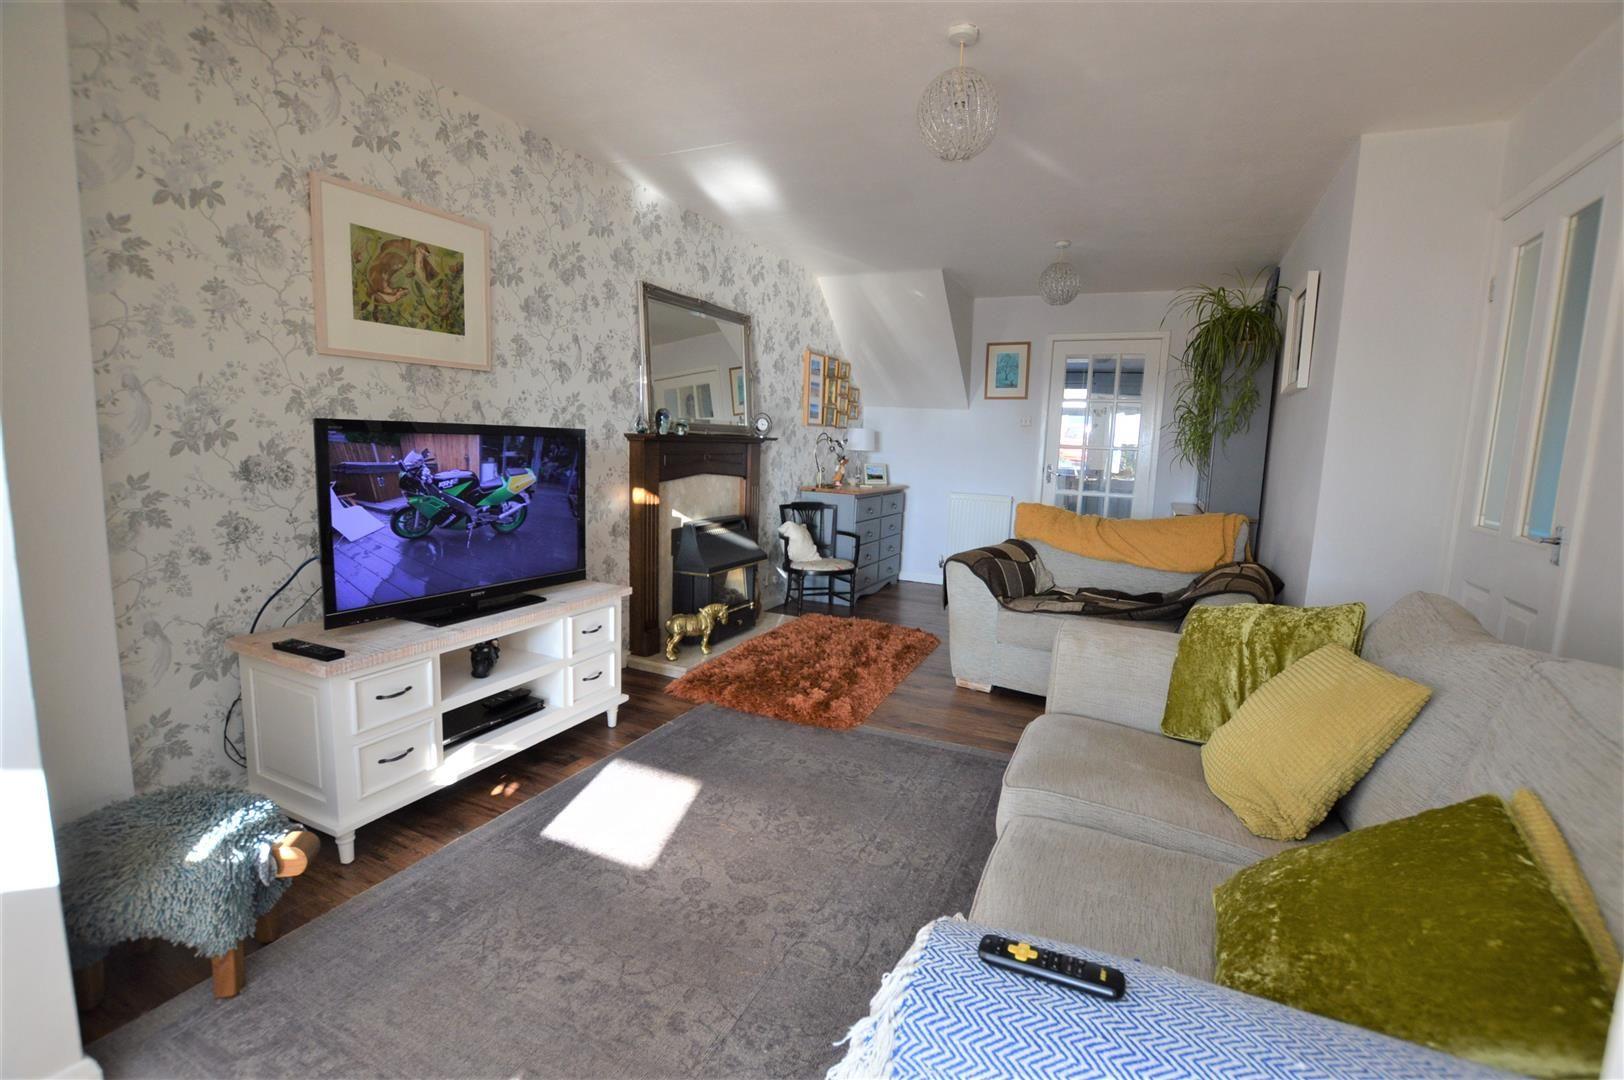 4 bed semi-detached for sale in Bromyard 2